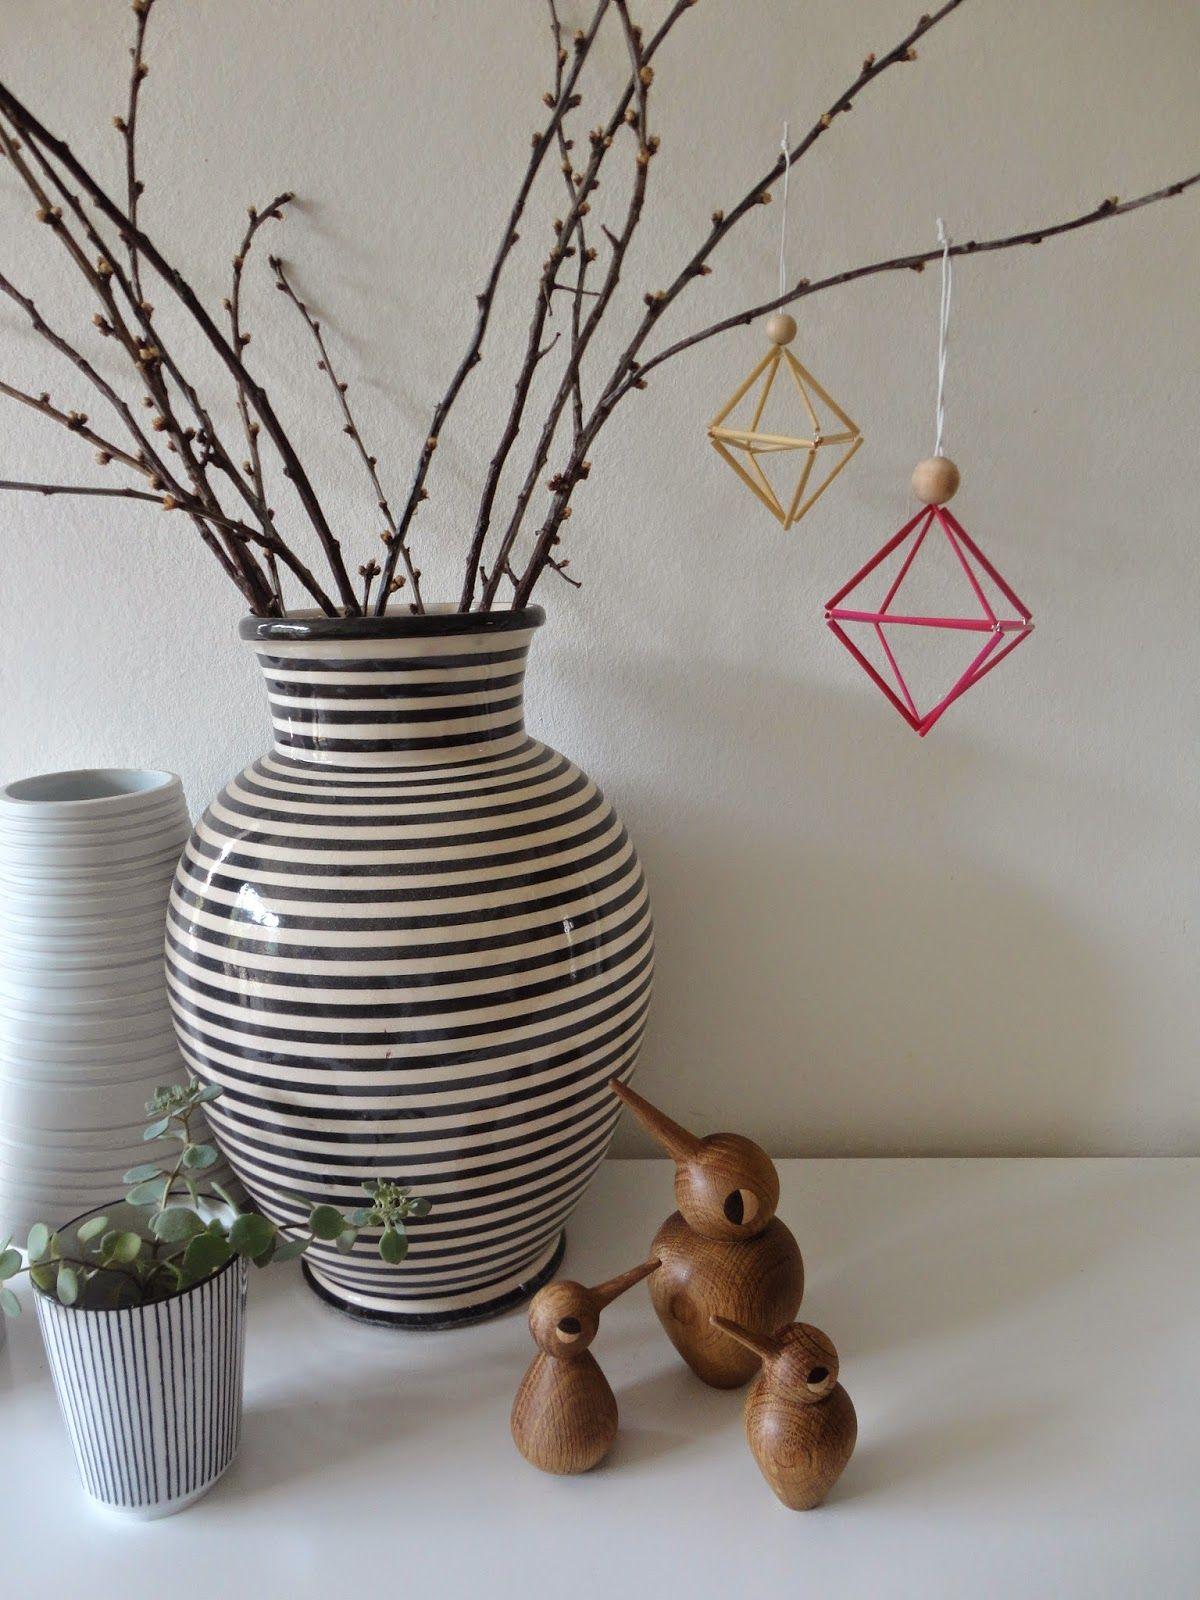 hej hanse wochenwerk strohhalm anh nger fall winter crafts pinterest stroh strohhalm. Black Bedroom Furniture Sets. Home Design Ideas